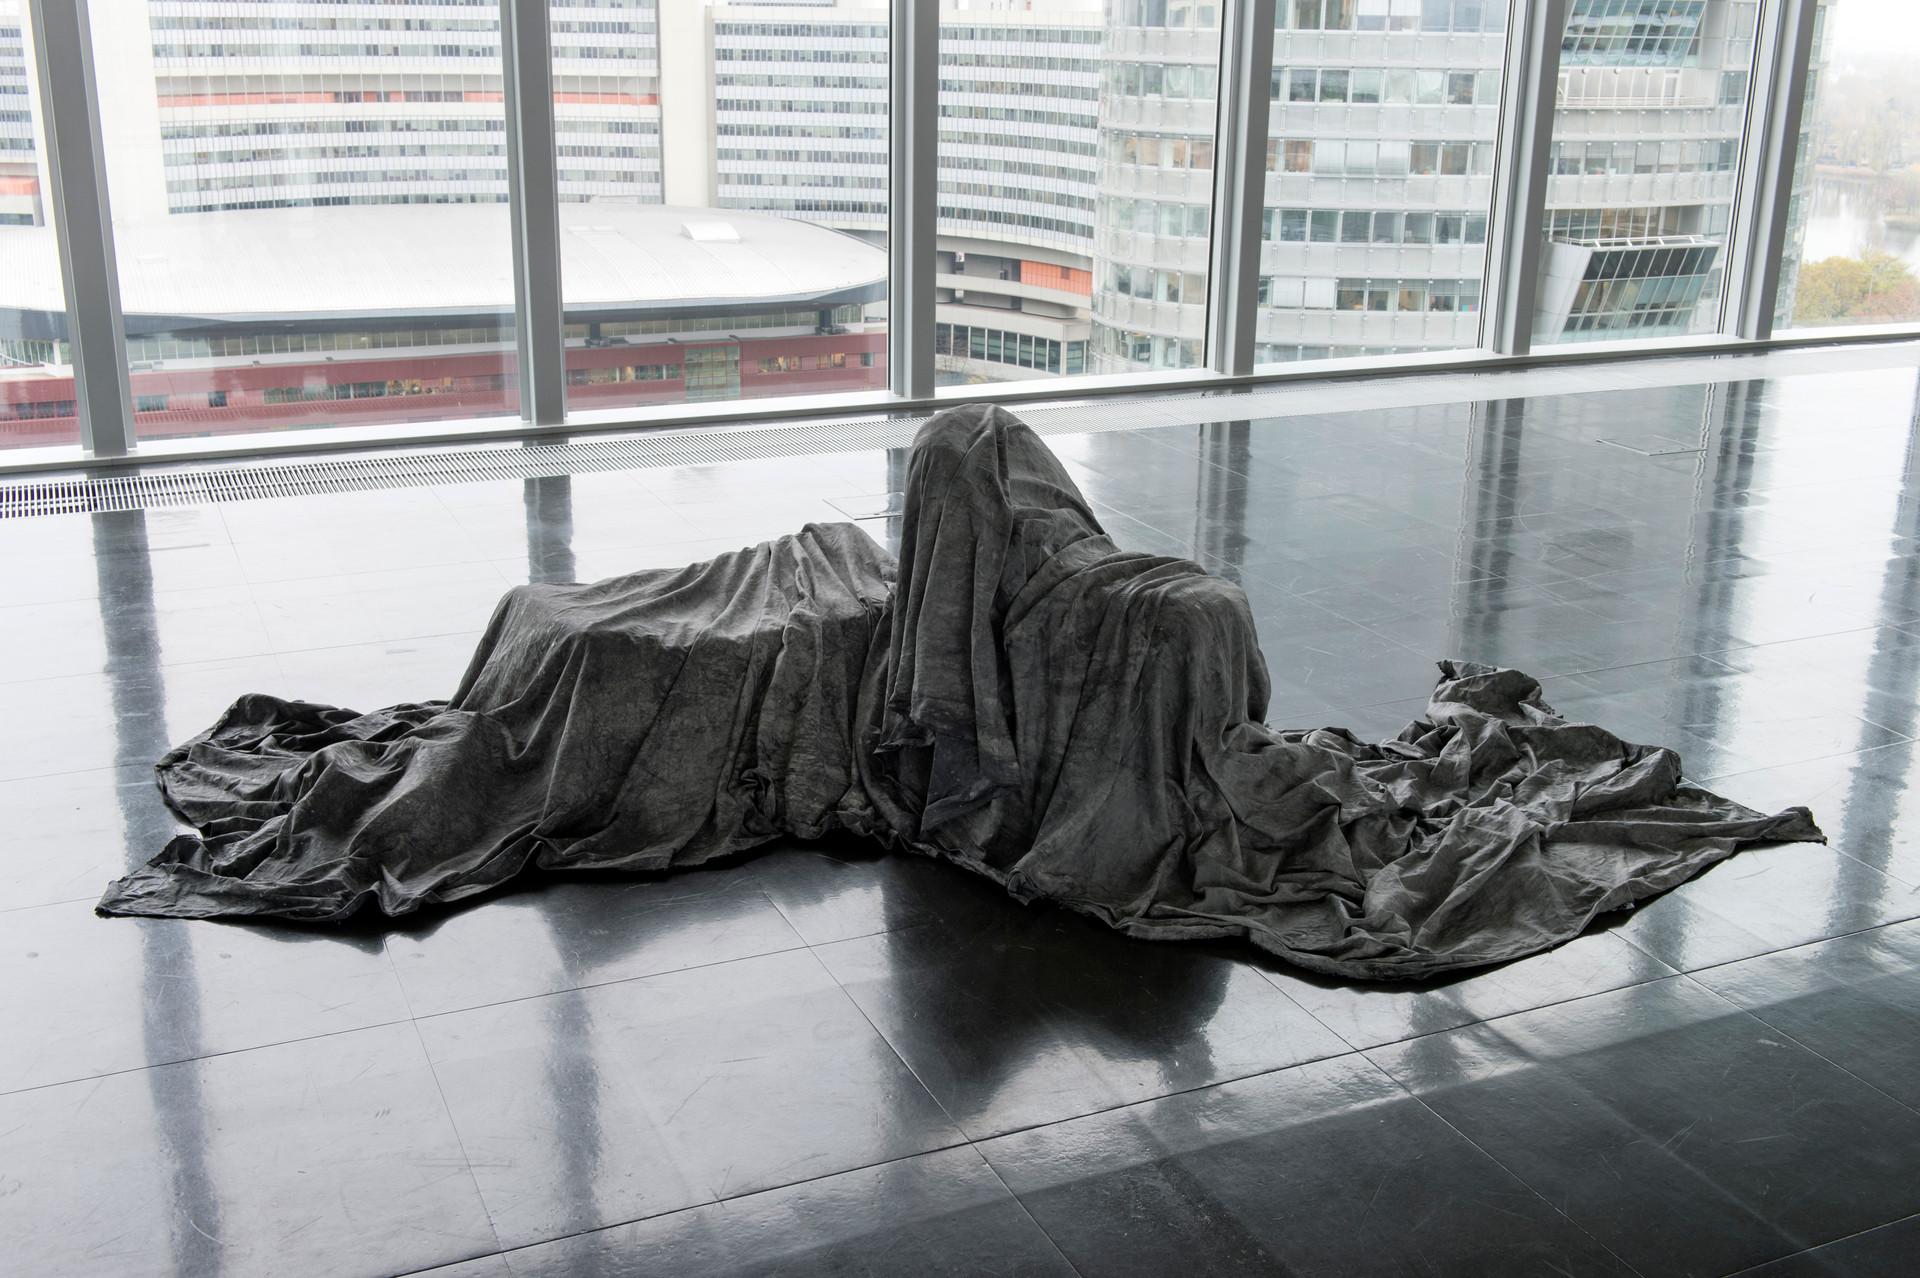 mahroum-ausgeschlossen (excluded). strabag kunstforum. 2019. pic by rudi froese